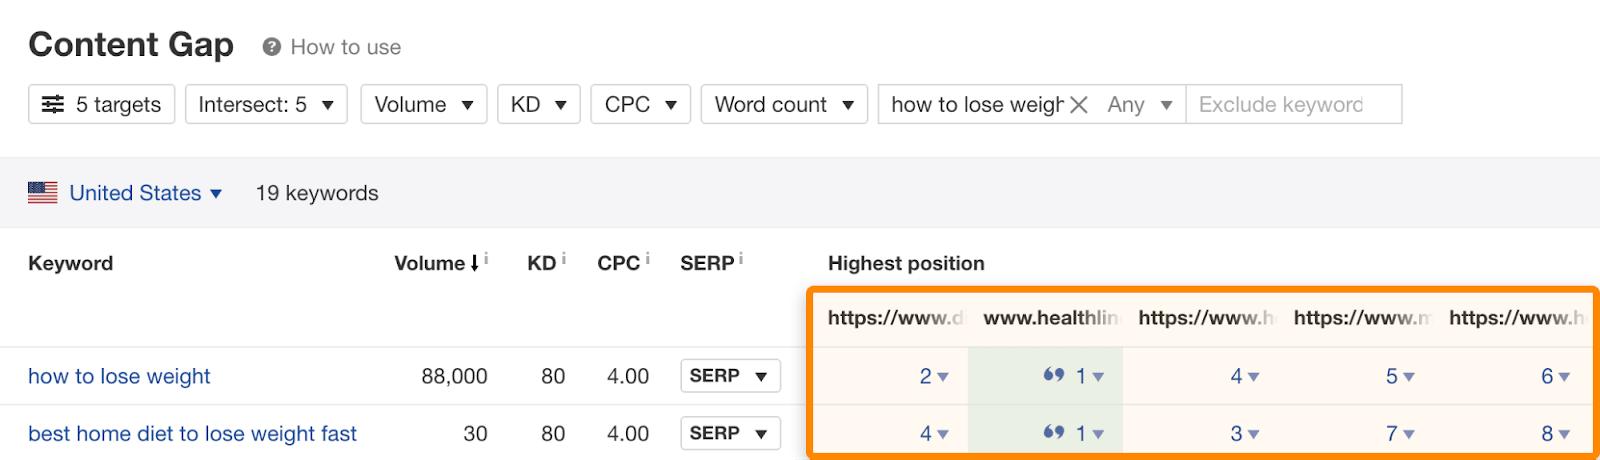 12 content gap same rankings